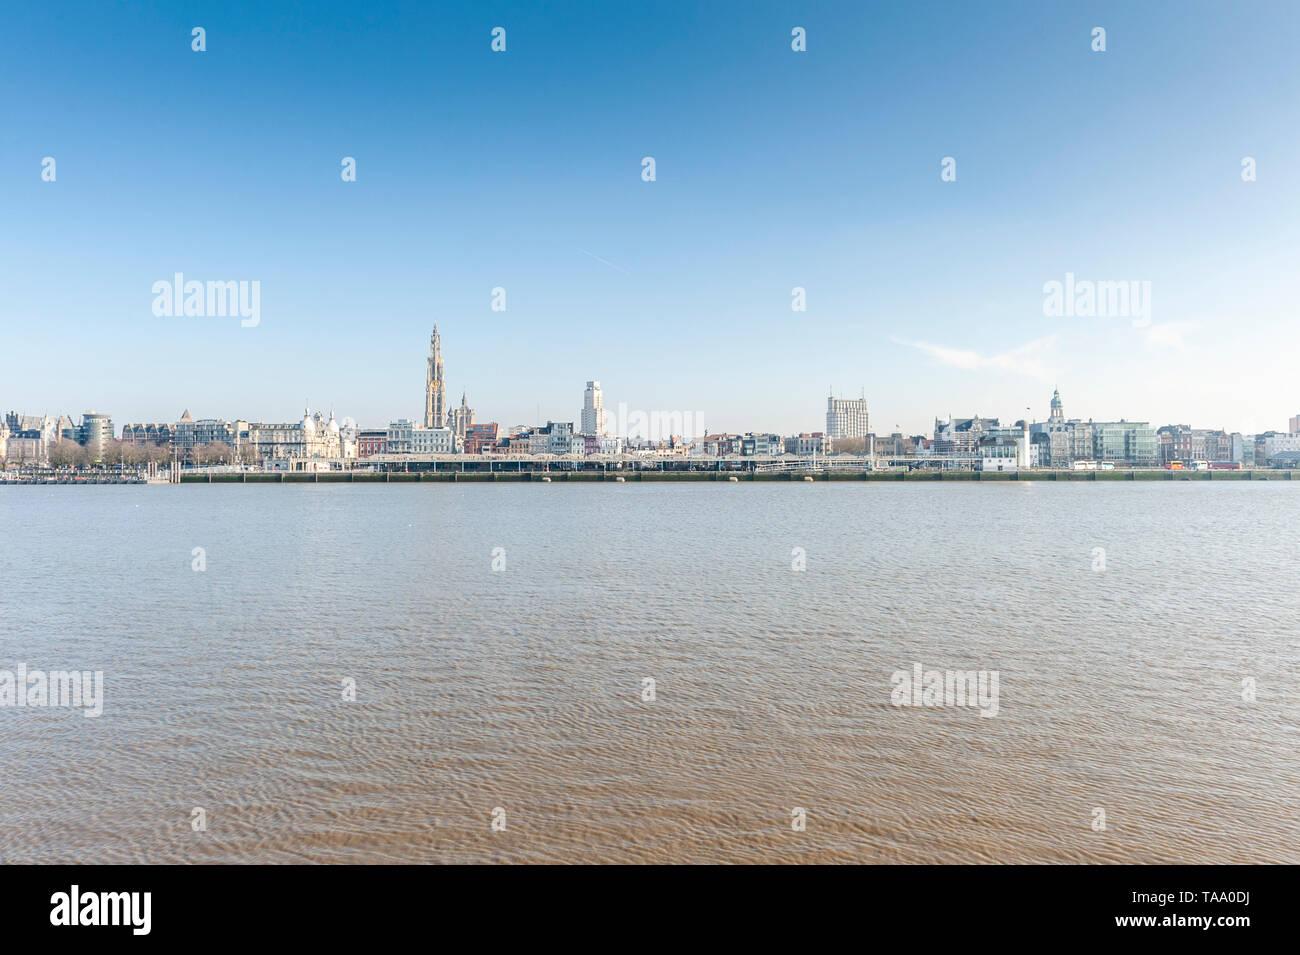 Belgium, Antwerp - 15 February 2015: cityscape of Antwerp as seen from Linkeroever - Stock Image